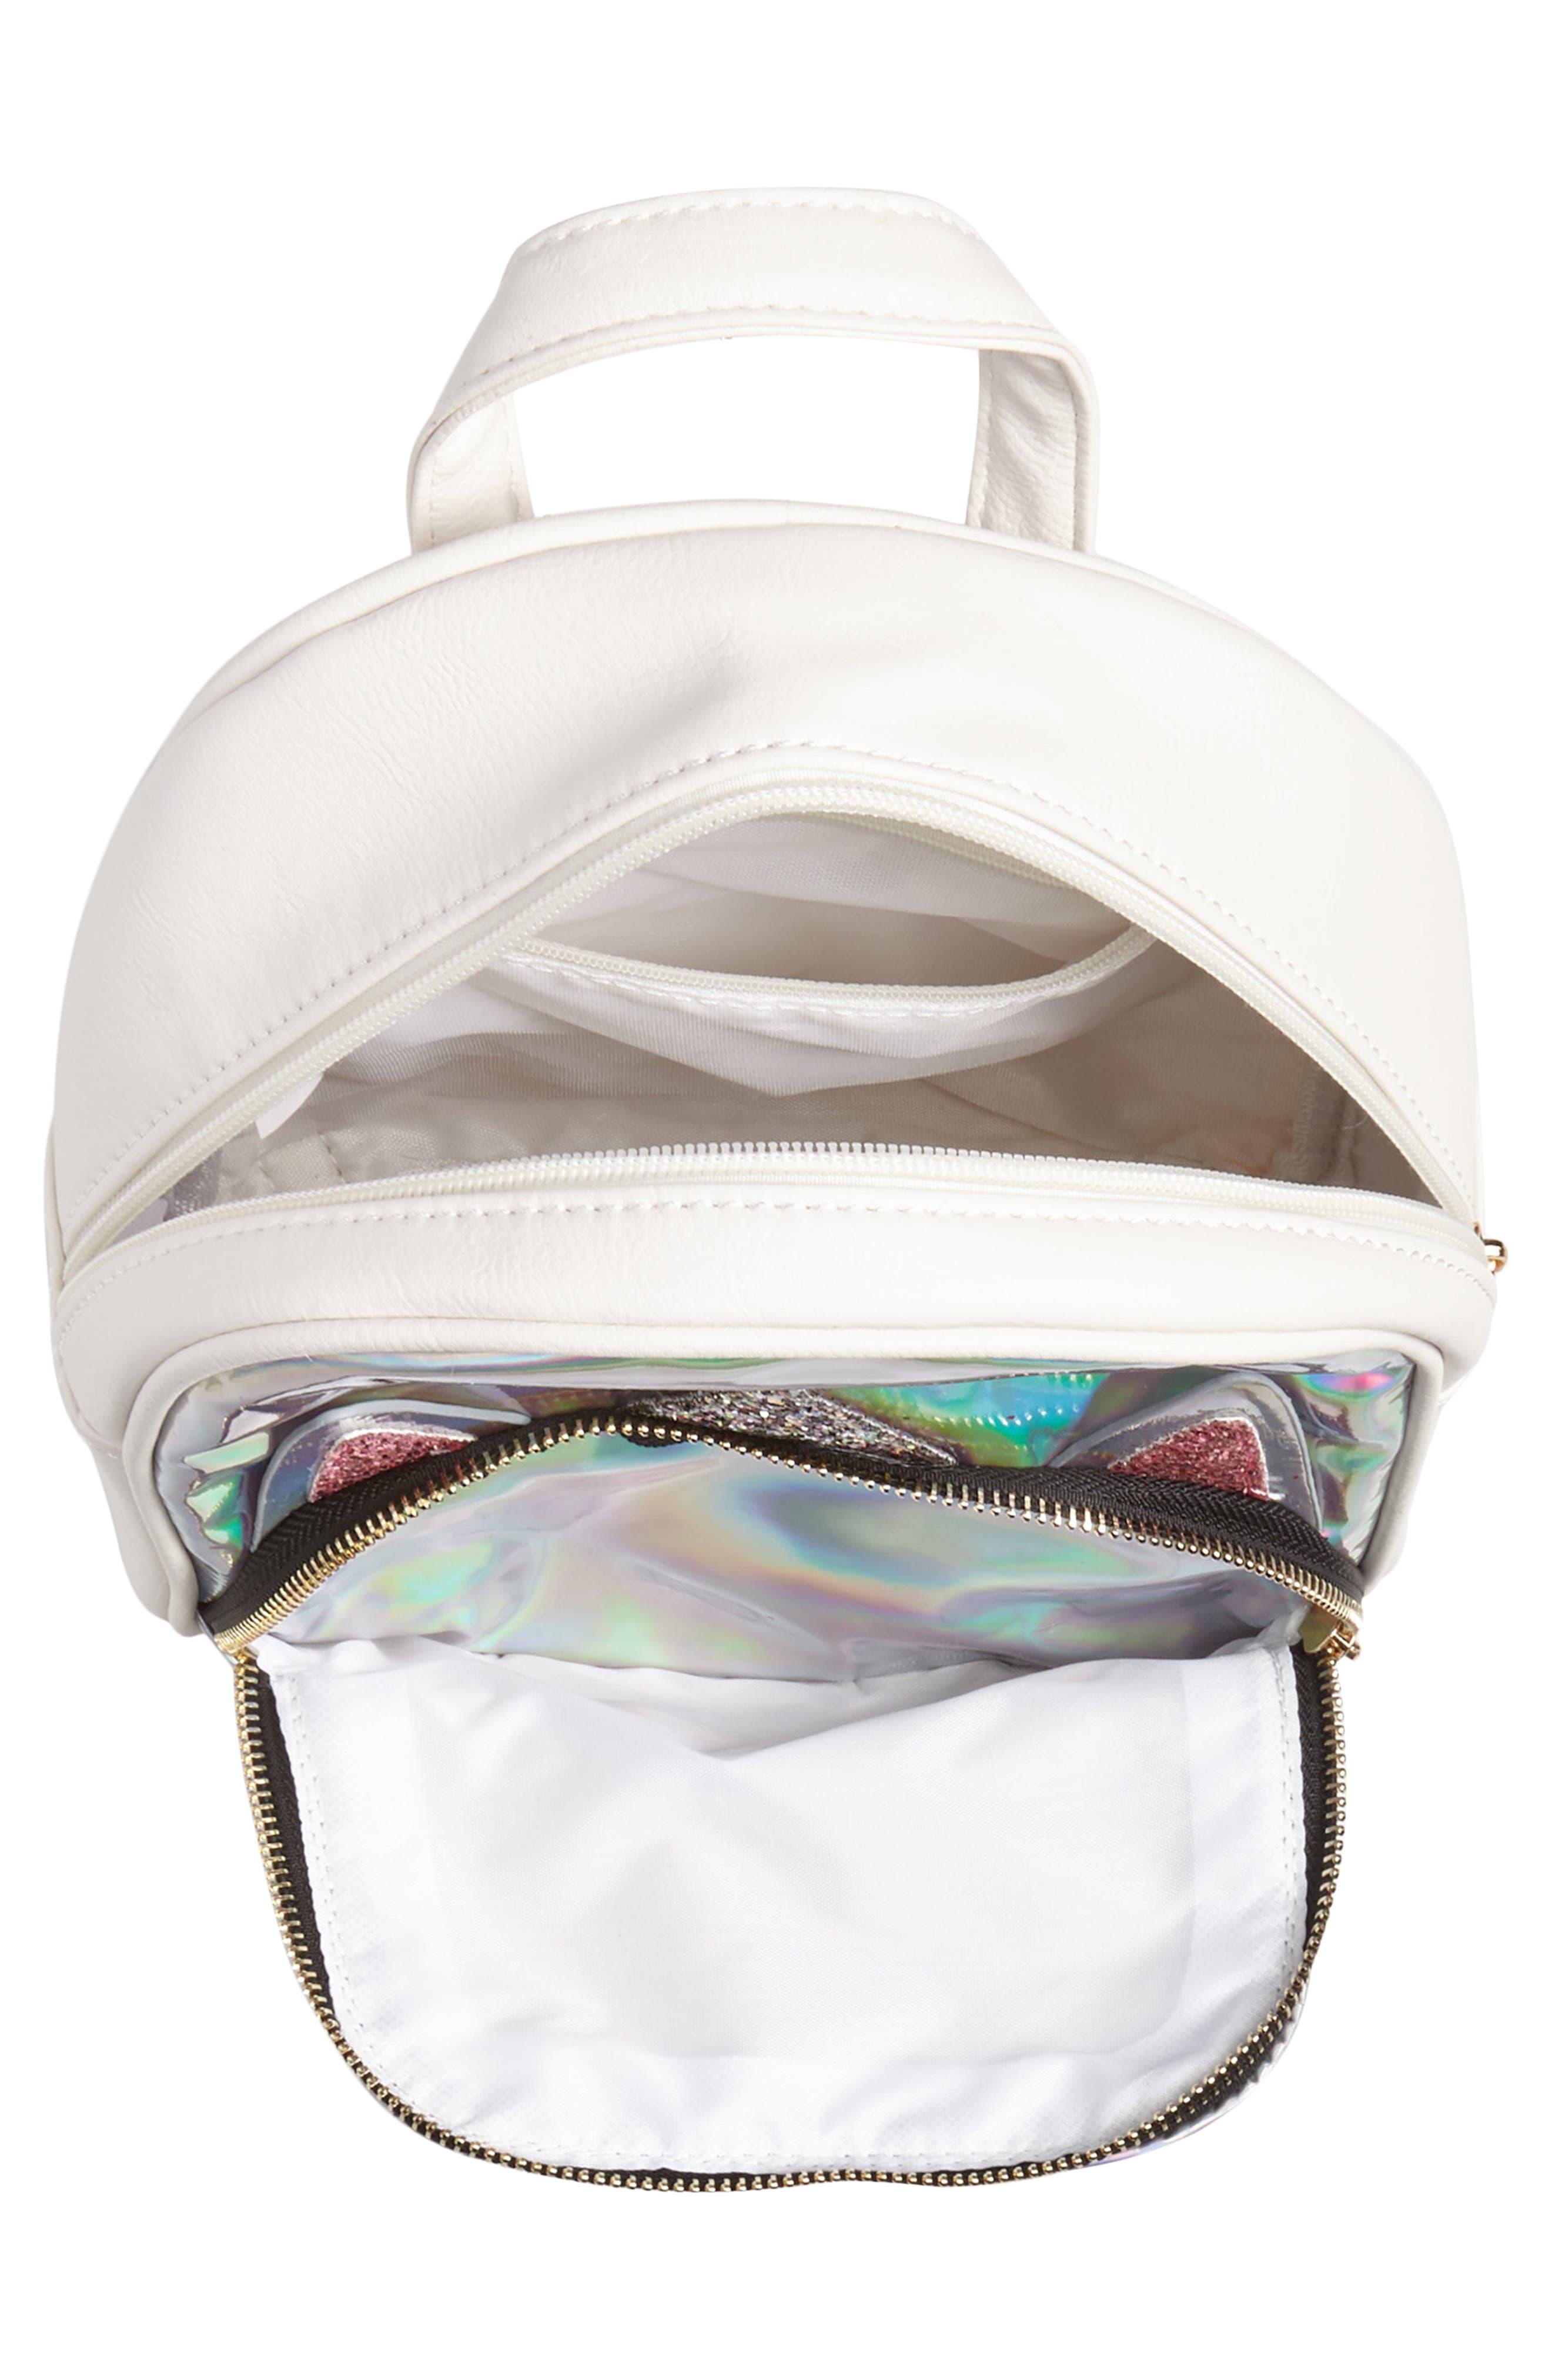 Mini Hologram Unicorn Backpack,                             Alternate thumbnail 3, color,                             SILVER